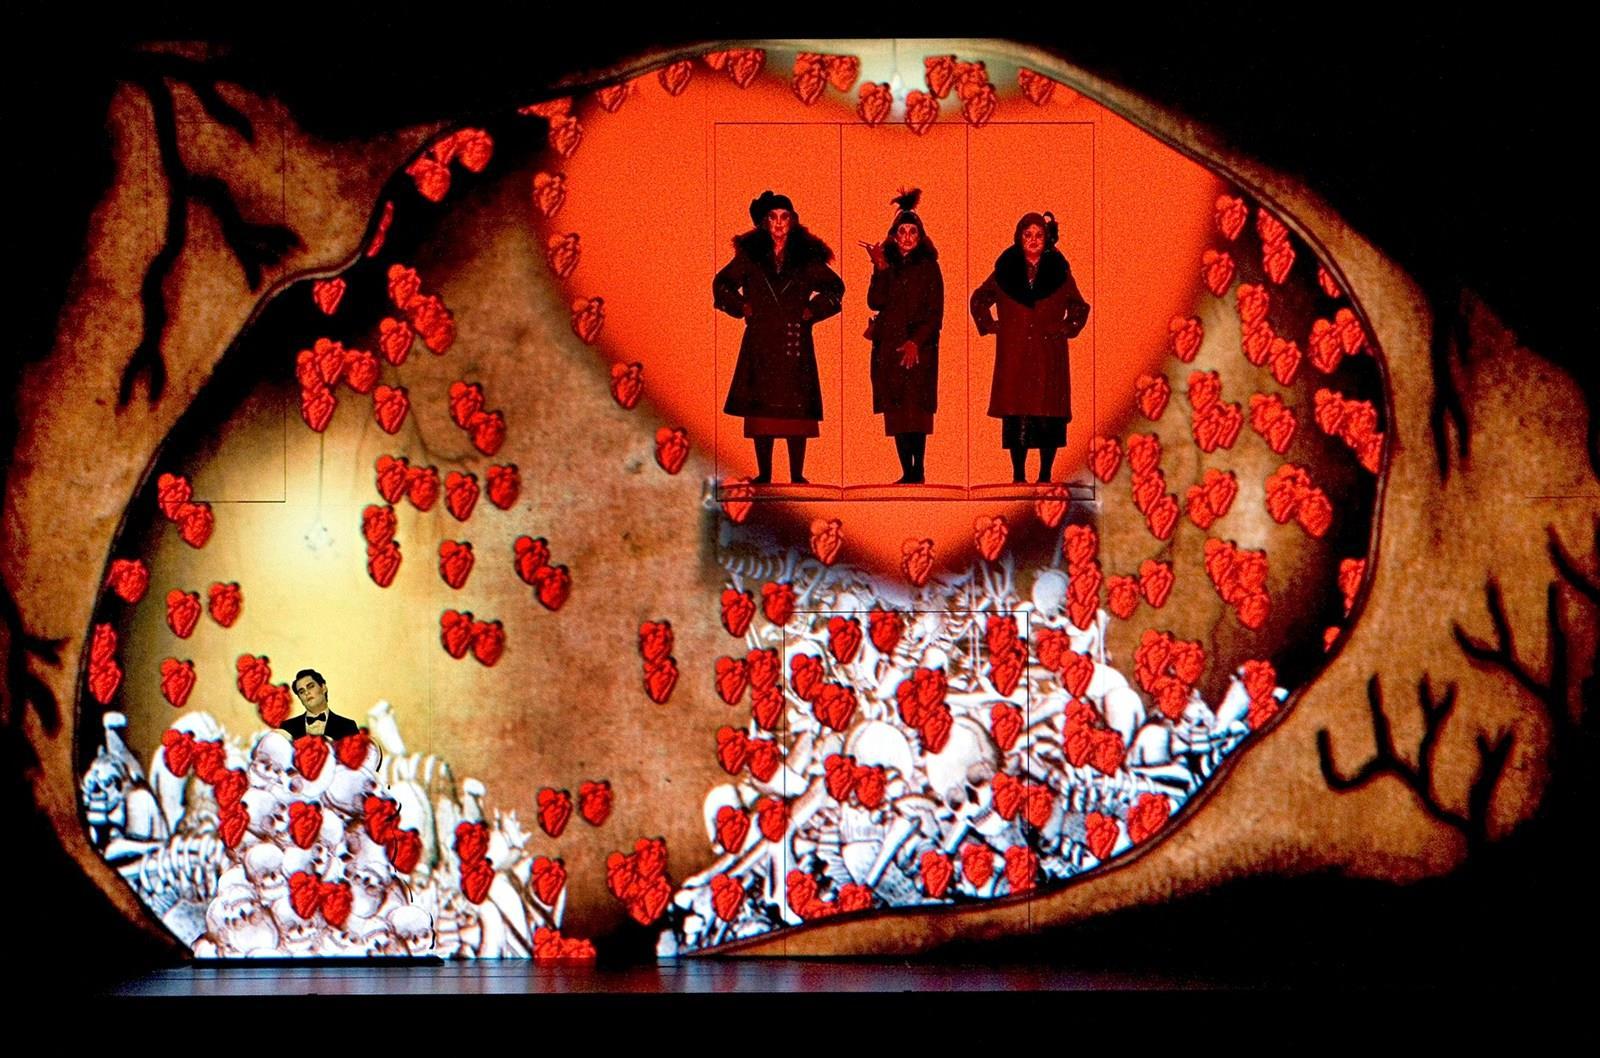 Mozart: A varázsfuvola – A Komische Oper Berlin vendégjátéka / BTF 2017